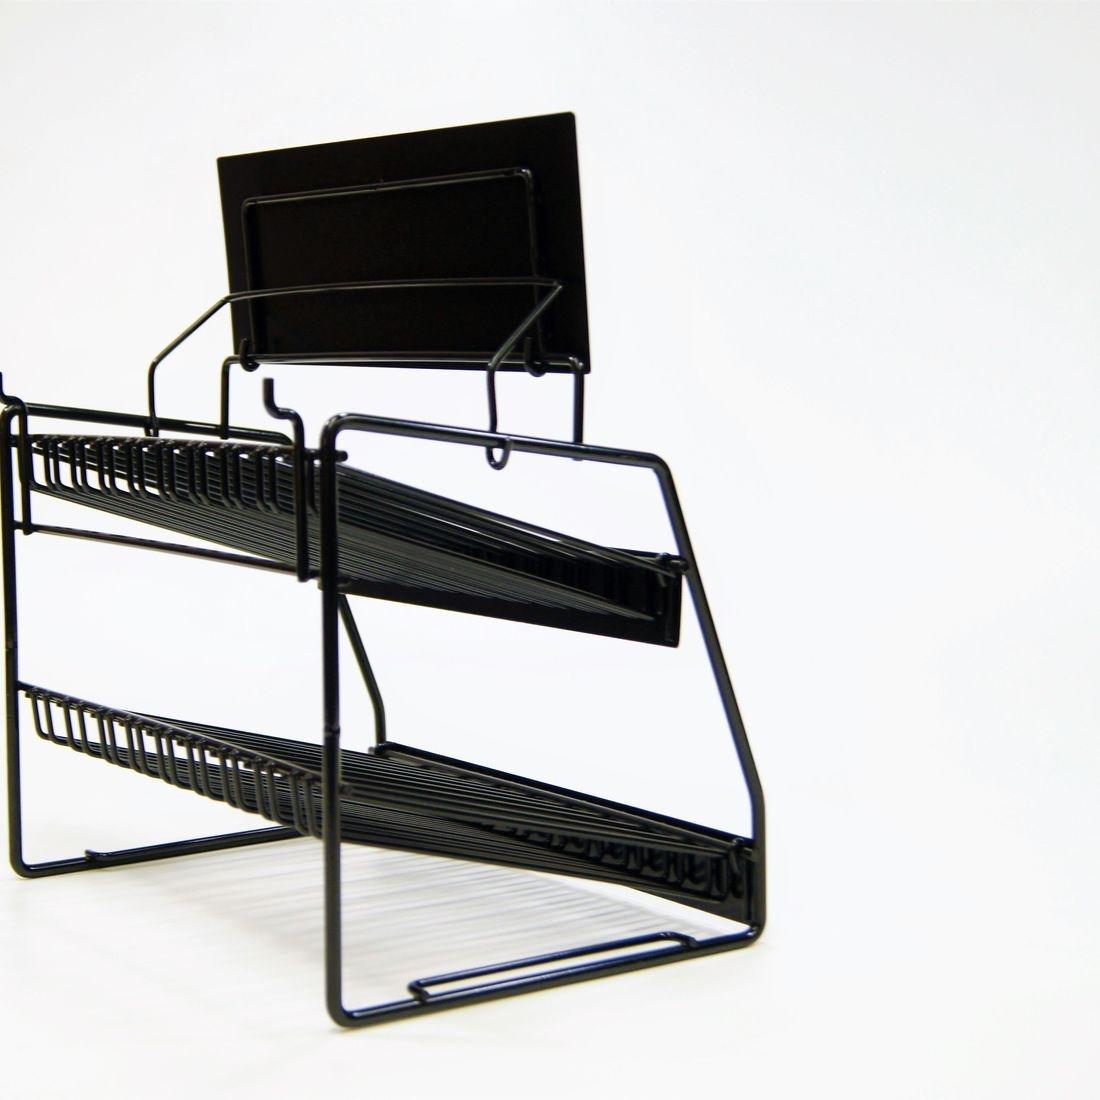 Counter Display Rack